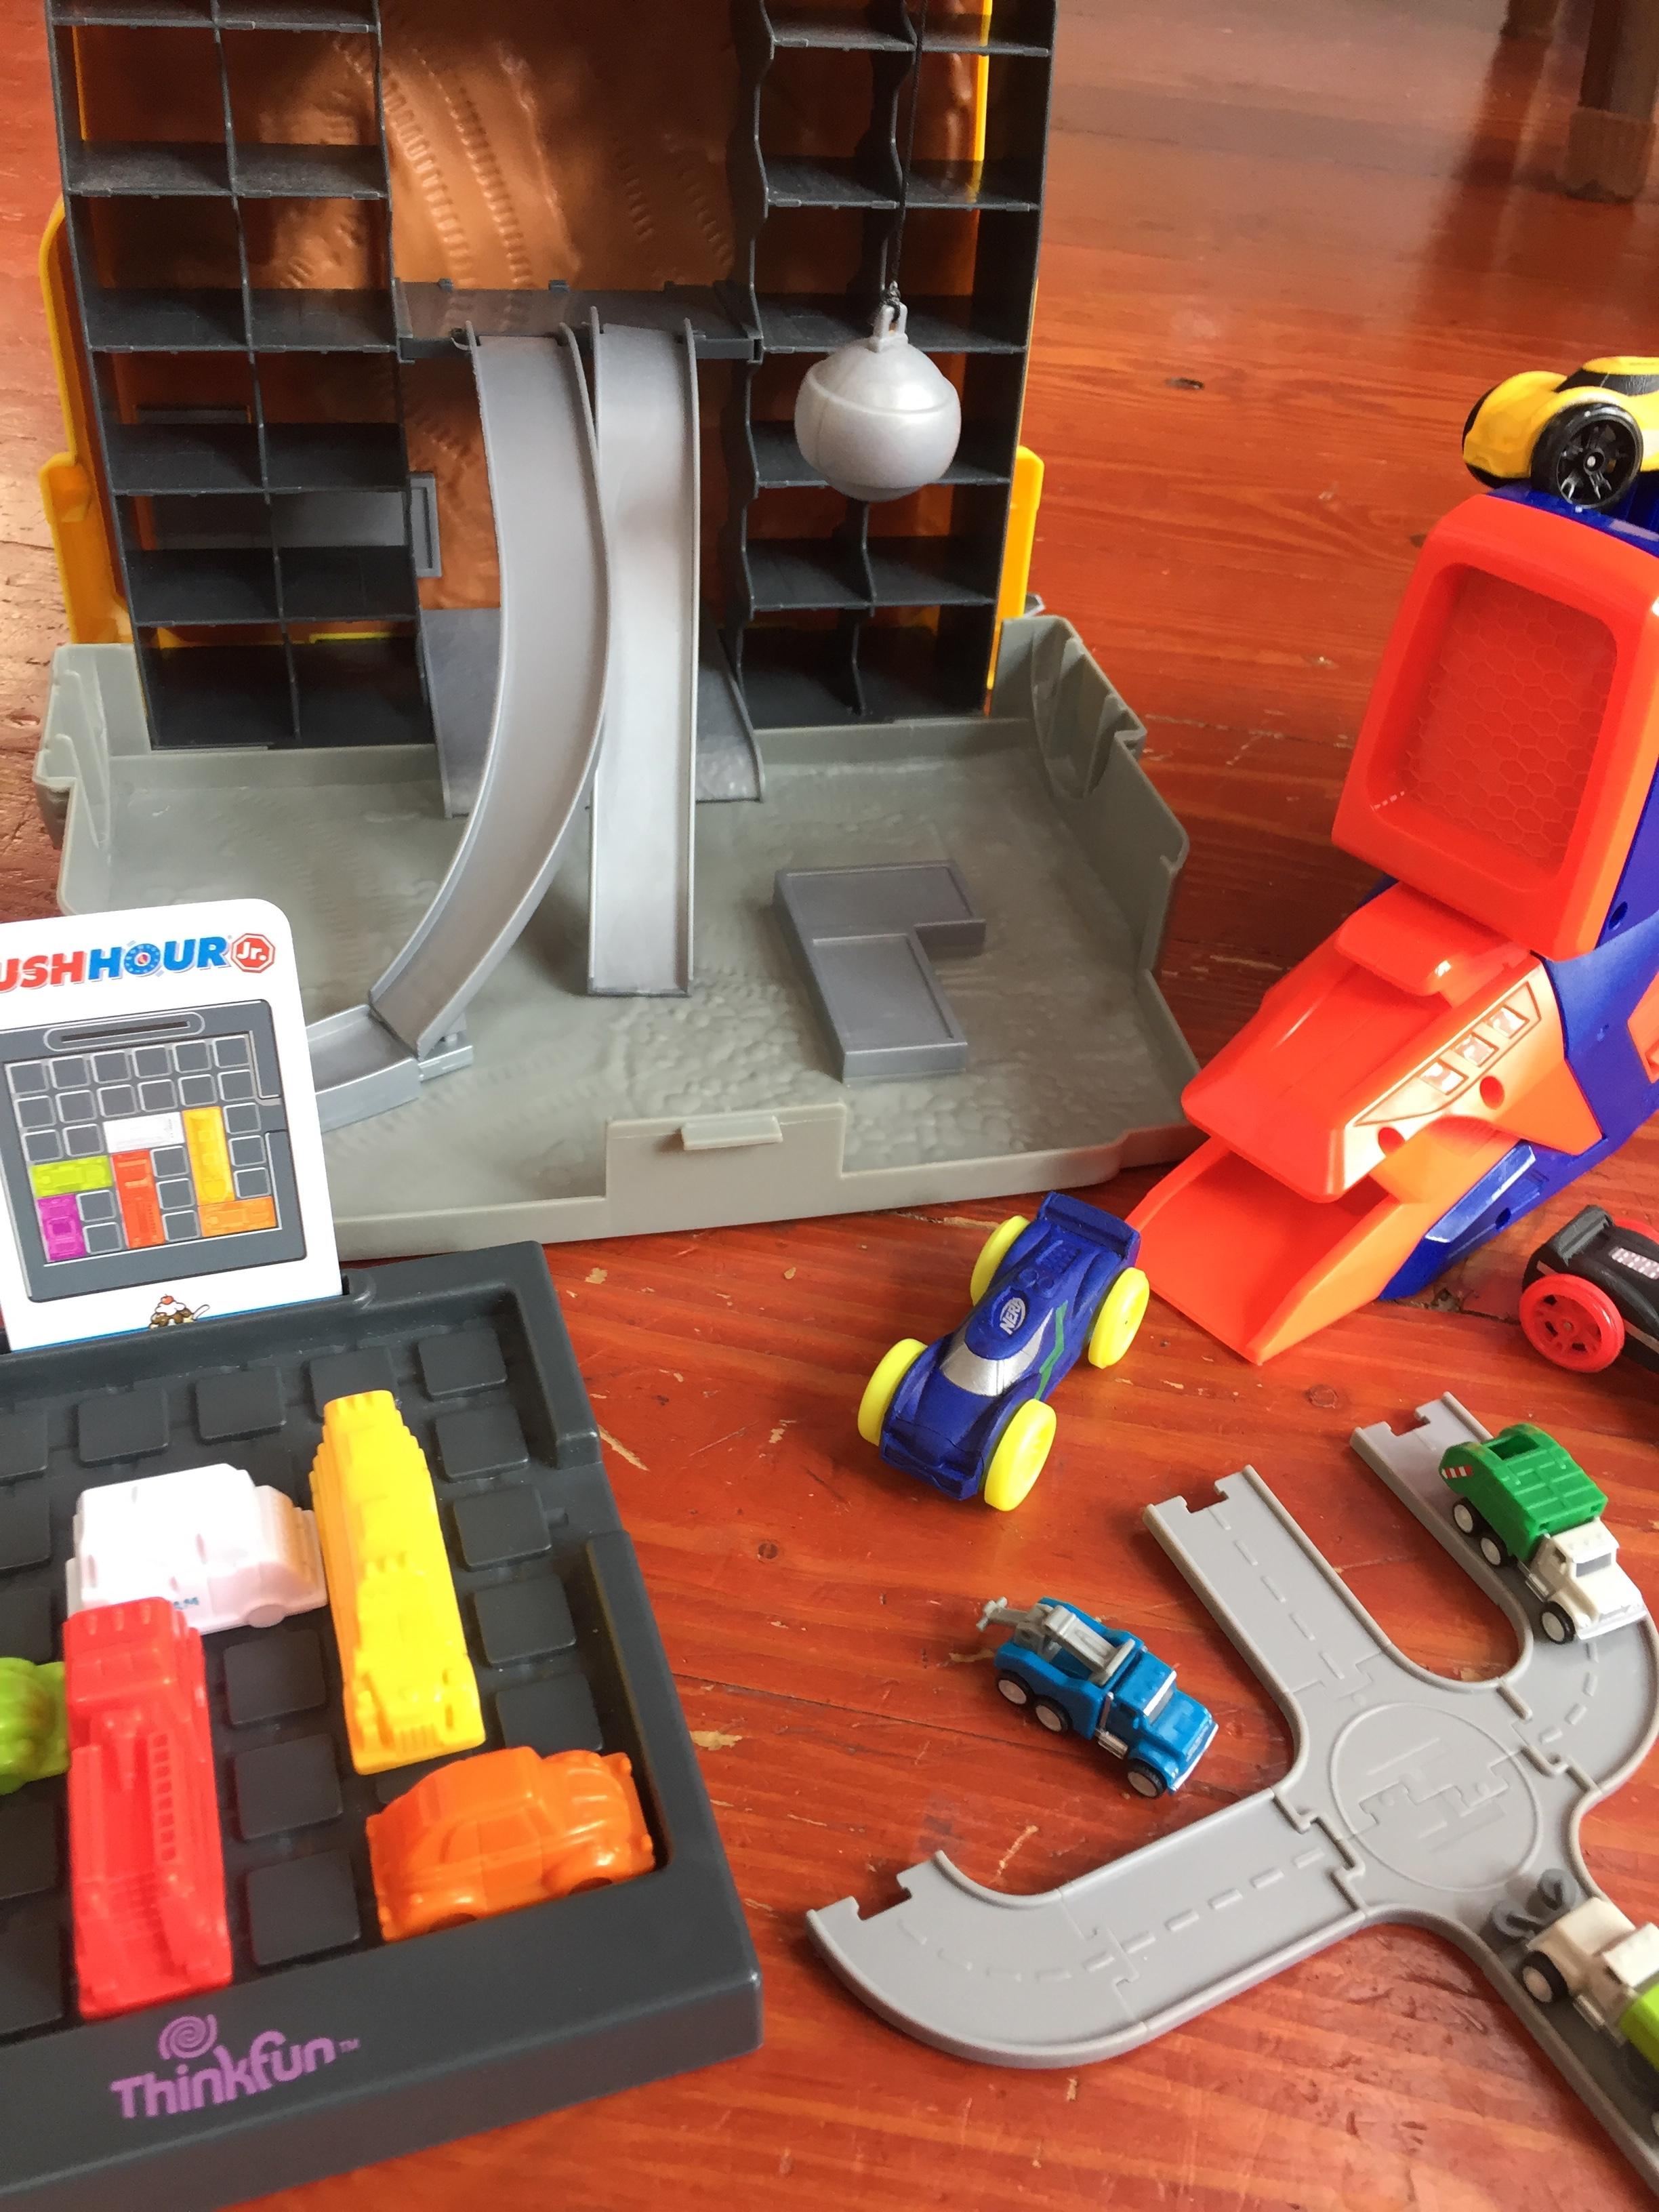 Tonka Tinys Construction play set Rush Hour Jr logic puzzle game Nerf Nitro foam car launcher Driven Pocket Series